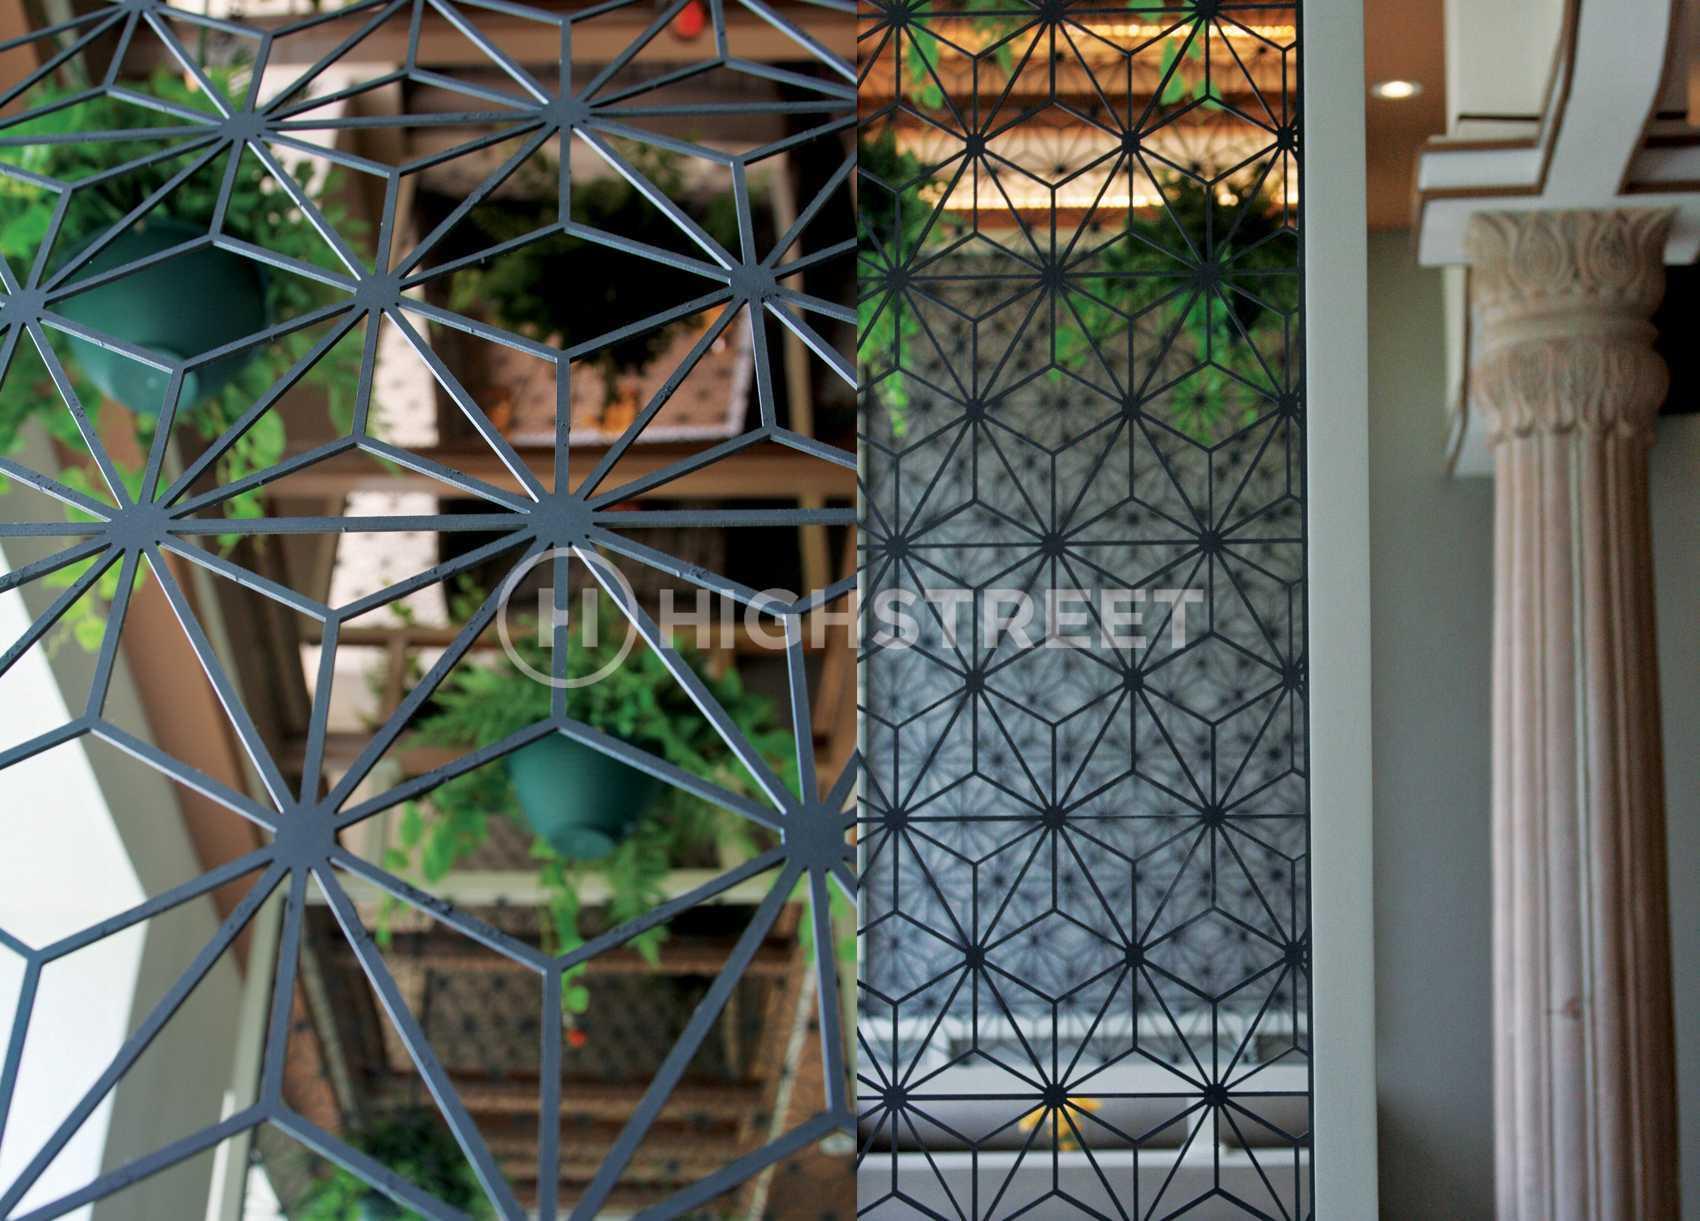 Highstreet Ganesha Ek Sanskriti Menara Bri Rt.9/rw.1, Menteng Dalam, Kec. Tebet, Kota Jakarta Selatan, Daerah Khusus Ibukota Jakarta 12870, Indonesia Rt.9/rw.1, Menteng Dalam, Kec. Tebet, Kota Jakarta Selatan, Daerah Khusus Ibukota Jakarta 12870, Indonesia Highstreetstudio-Ganesha-Ek-Sanskriti-Menara-Bri  81821